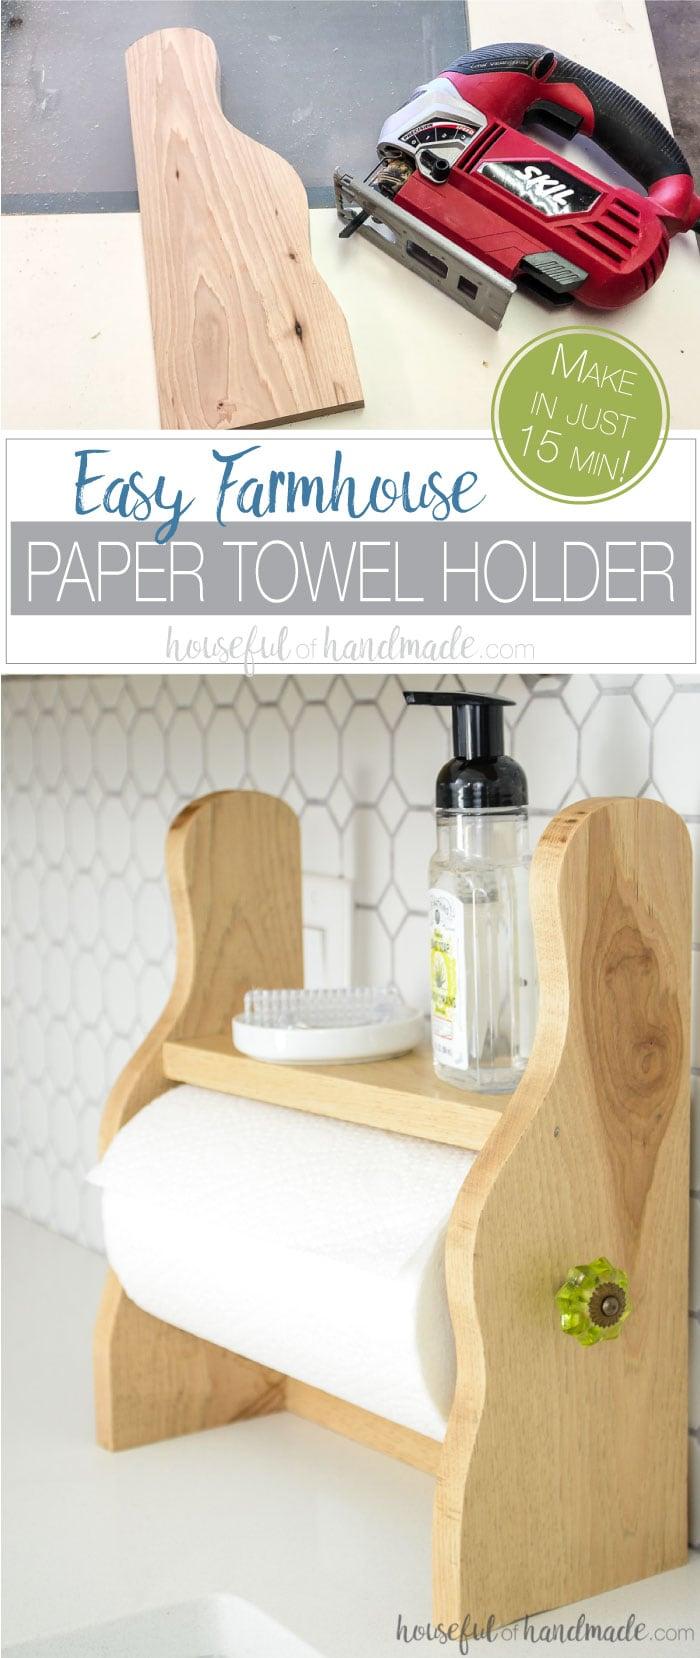 Farmhouse Paper Towel Holder Diy Houseful Of Handmade